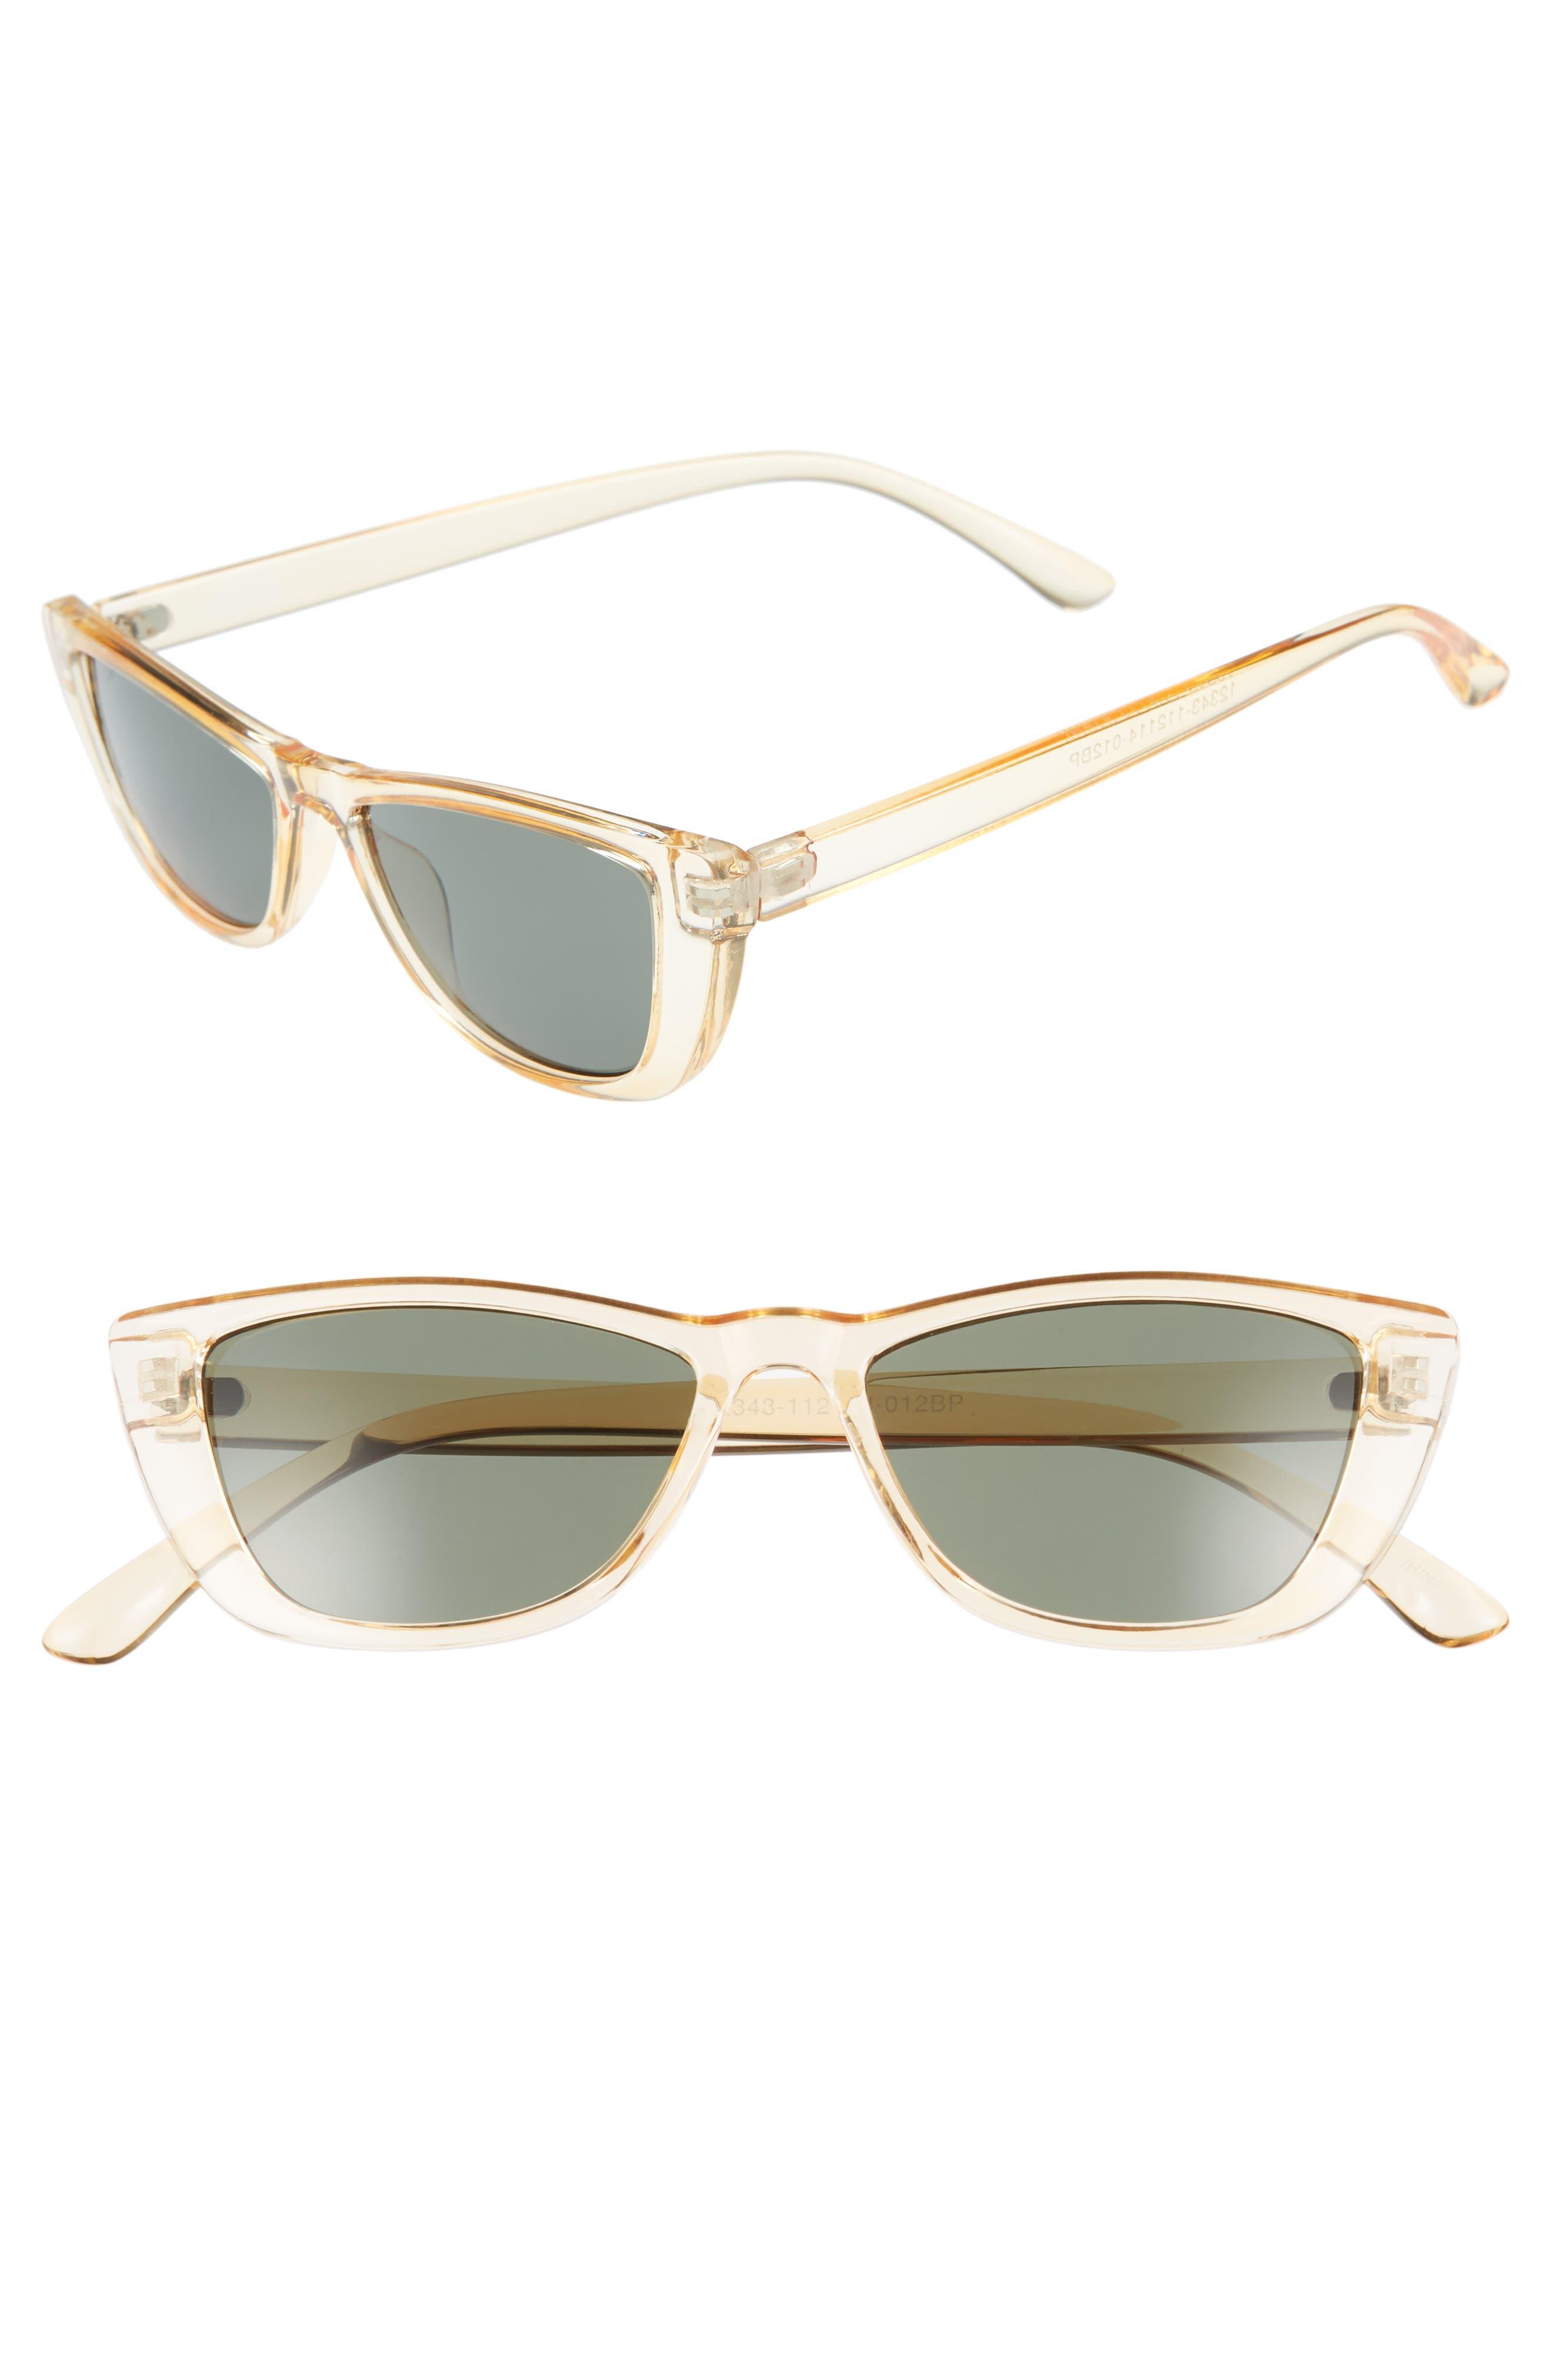 49mm Flat Top Rectangular Sunglasses,                         Main,                         color, 700